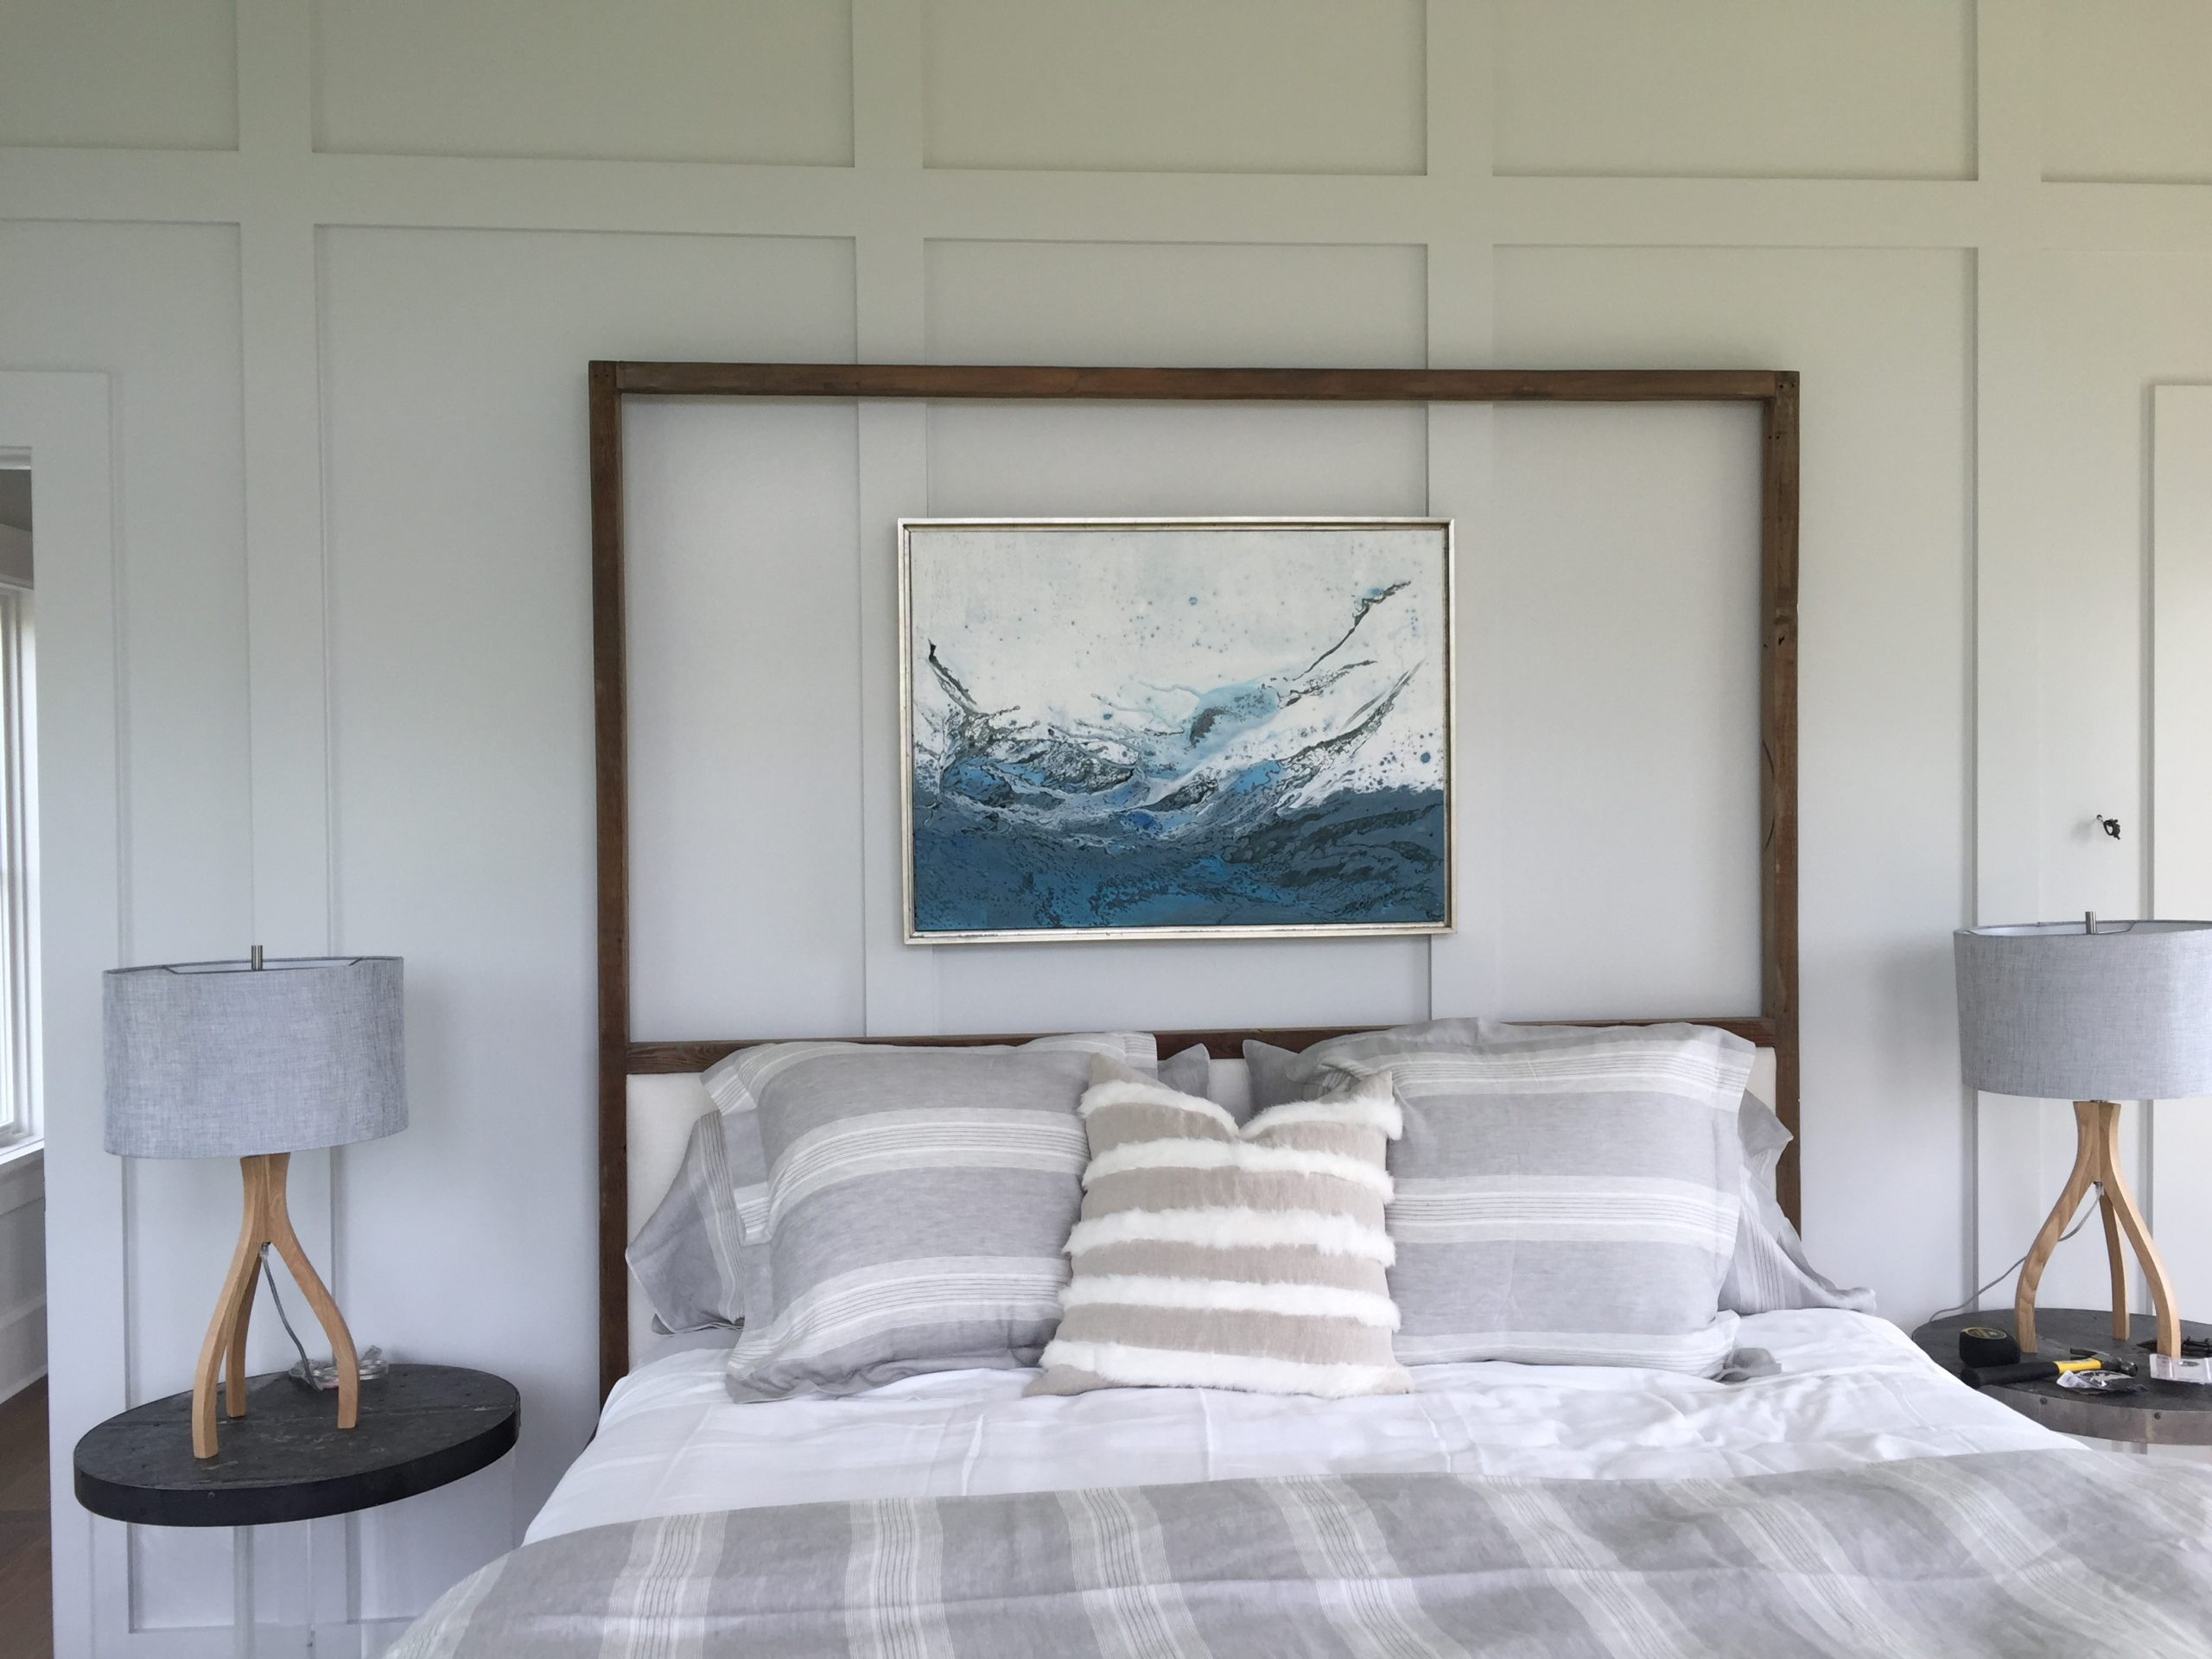 Sydney Marshman Design, wall art commissions